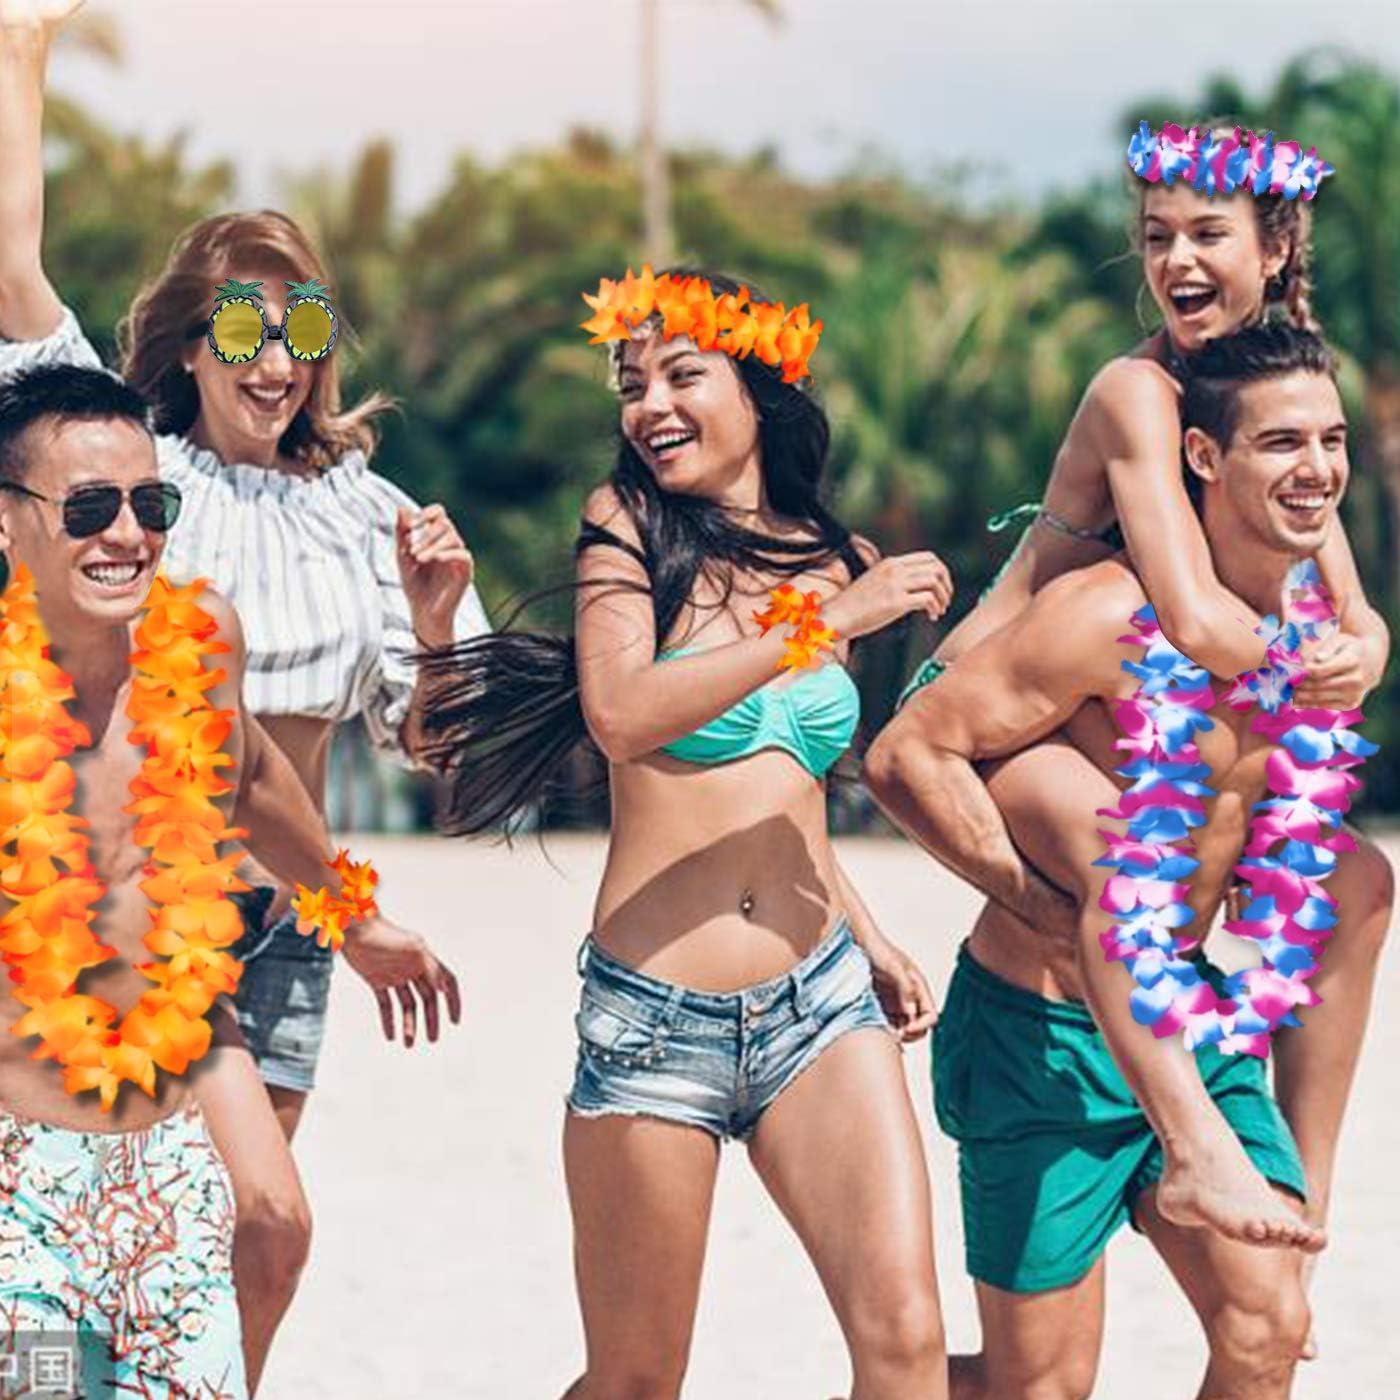 Wedding Birthday Hawaiian Leis Temporary Tattoos Stickers Funny Hawaiian Sunglasses for Hawaiian Party Decorations Summer Beach Vacation Tropical themed Party Favors